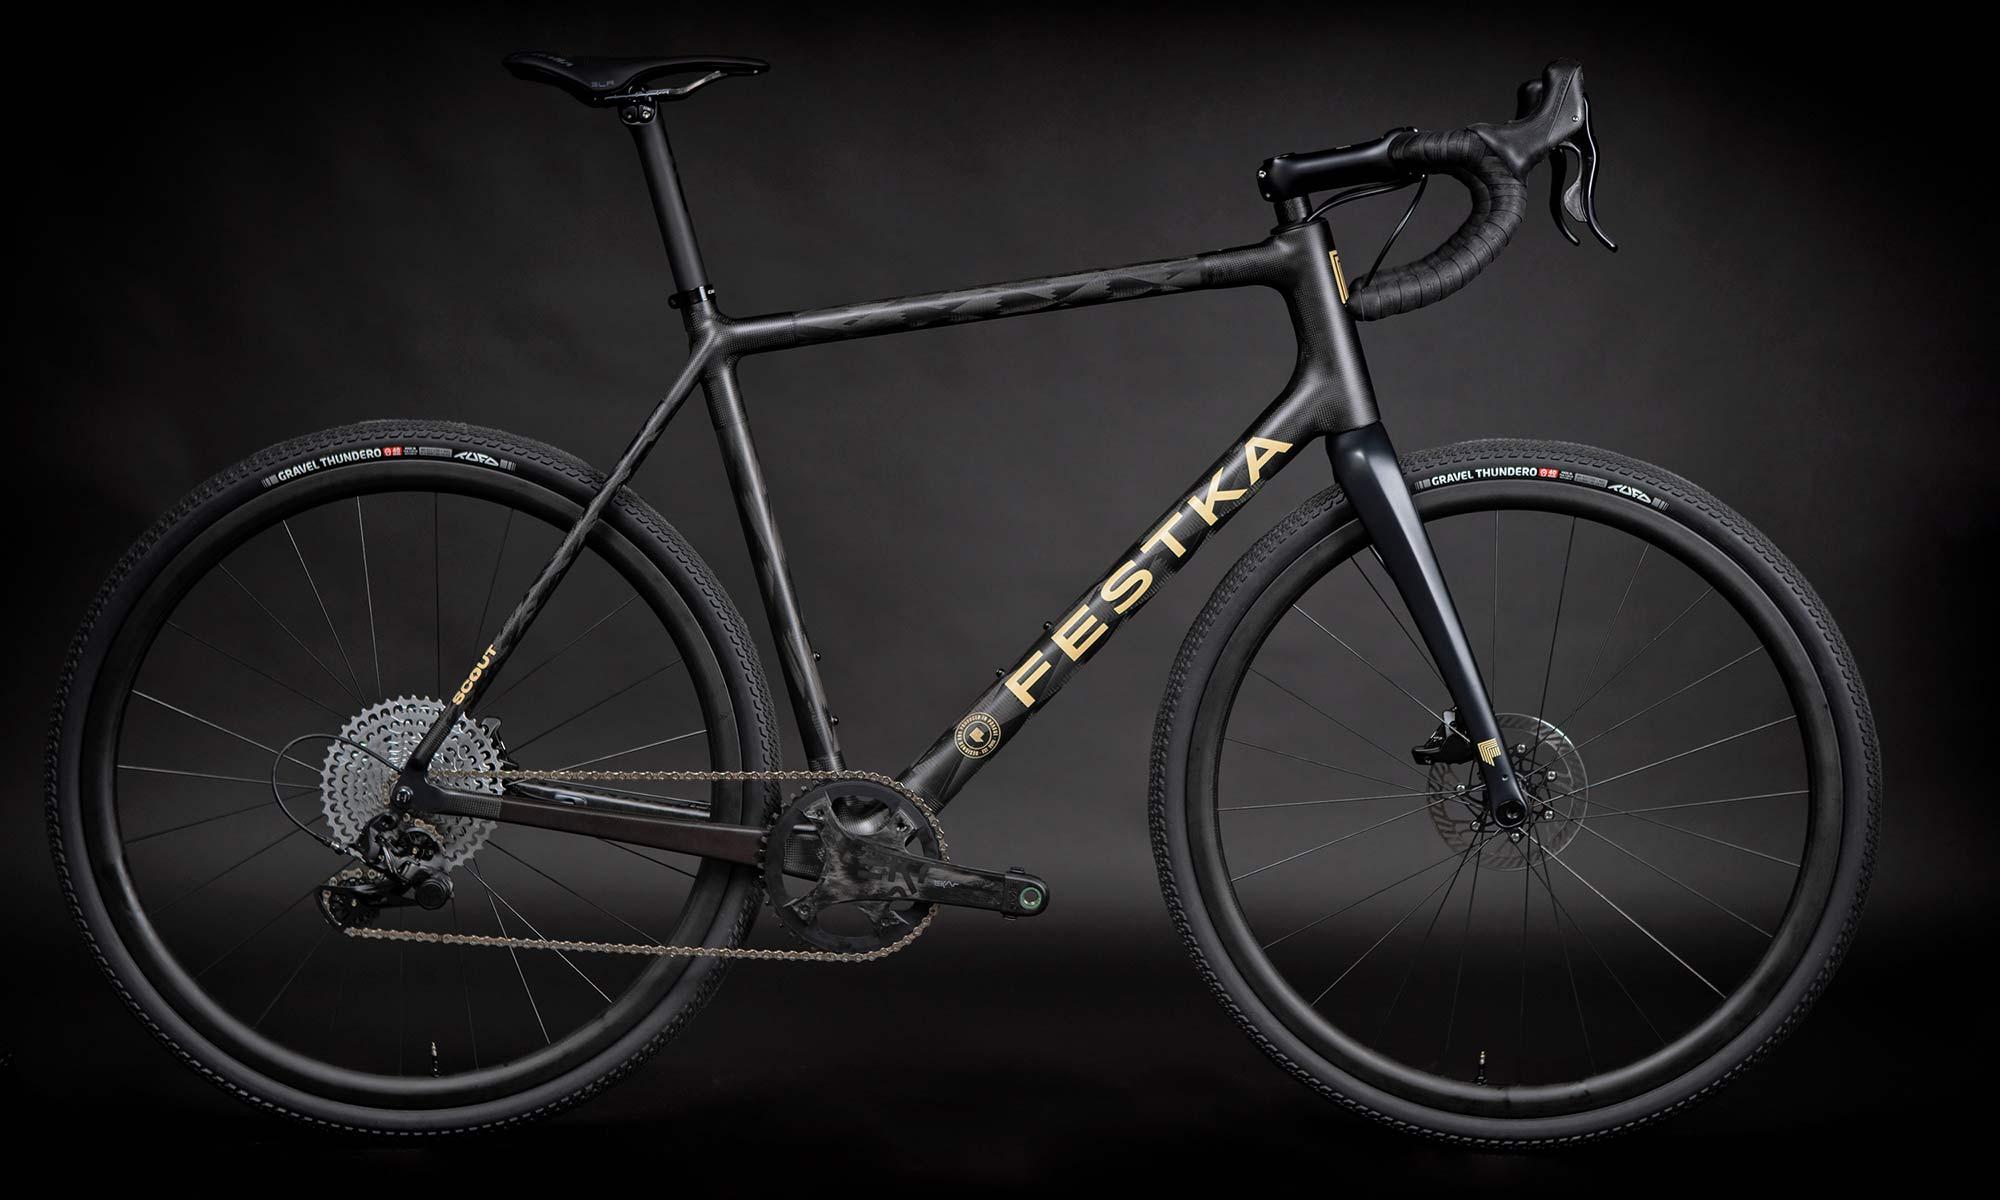 Festka Scout custom carbon adventure gravel bike,Campy Ekar